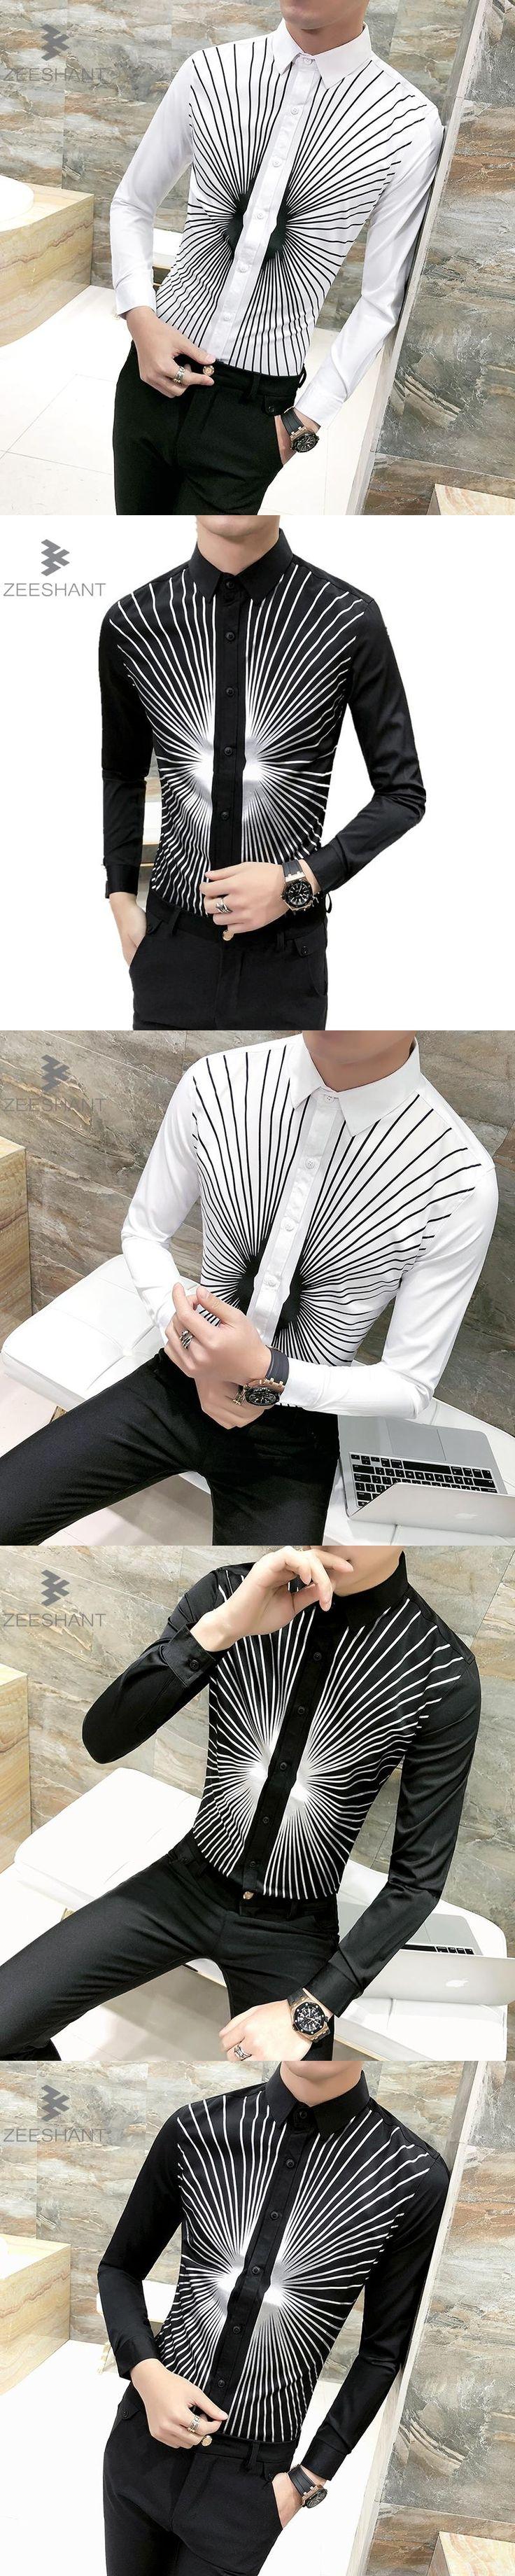 Zeeshant White Black Men Groom Tuxedos Best Men Wedding Shirts Formal Shirts Male in Men's Tuxedo Shirts XXXL